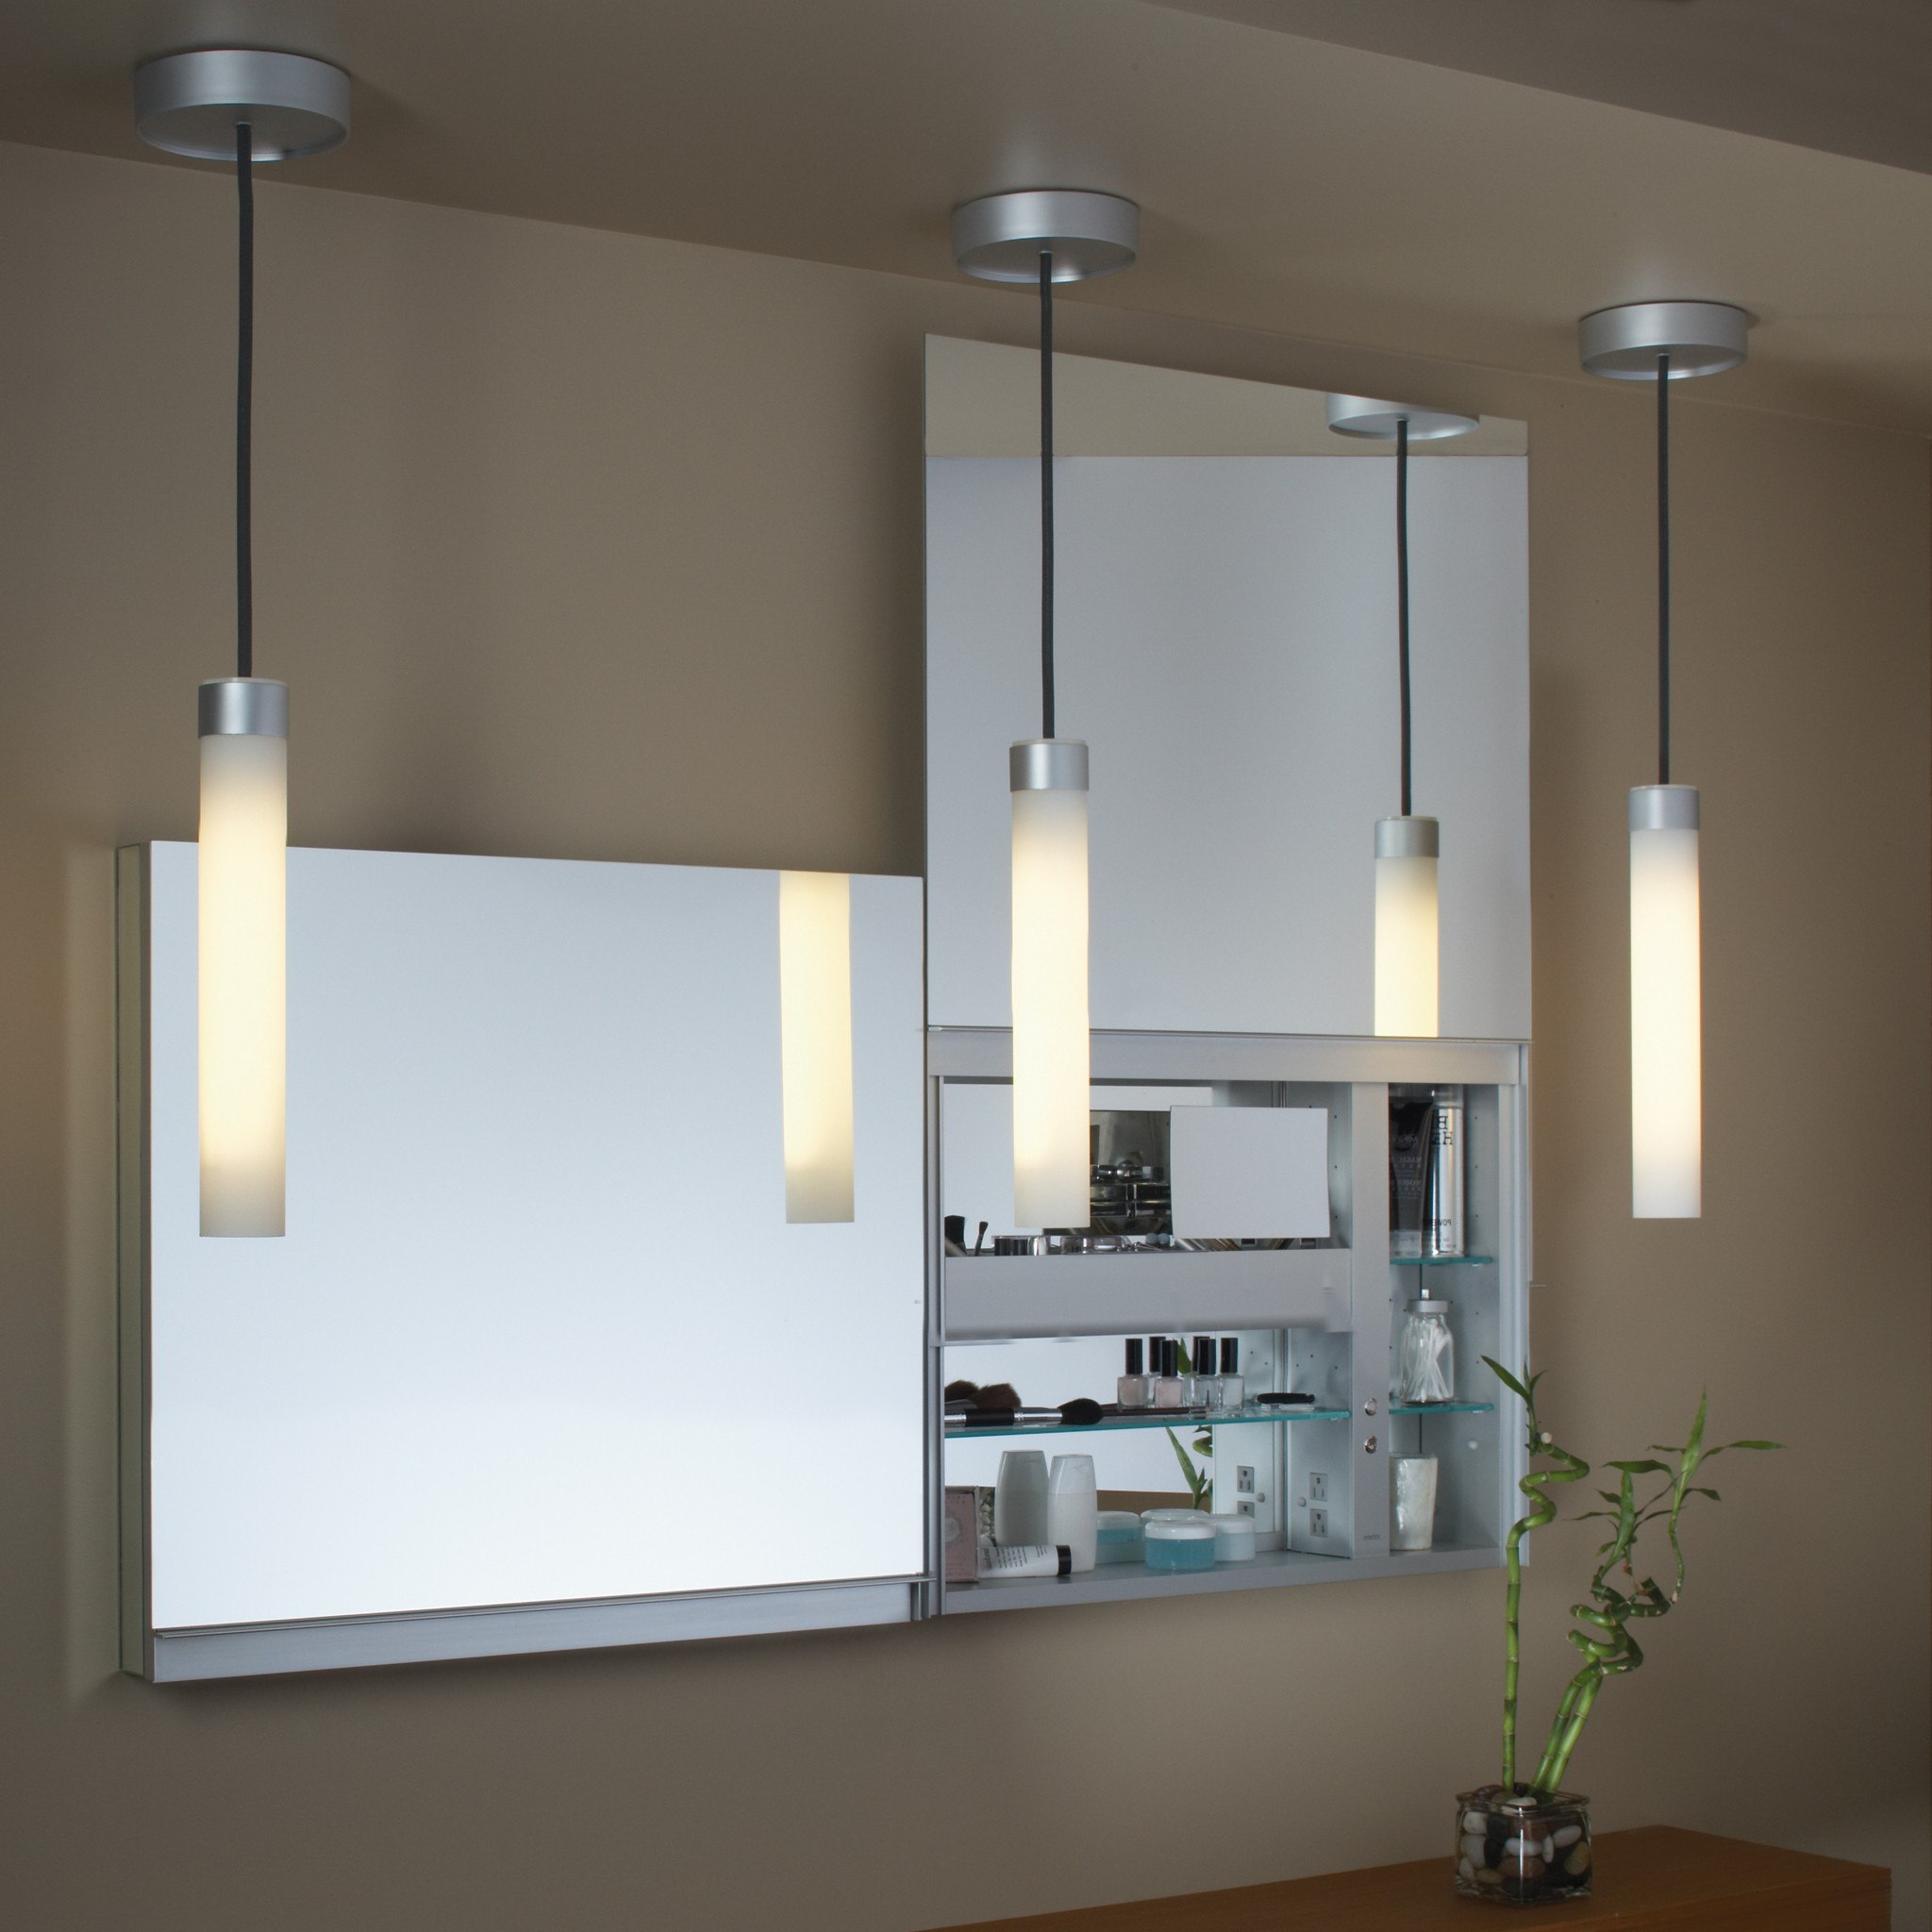 Robern Uc3027fpl Uplift Mirrored Medicine Cabinet 30 Inch